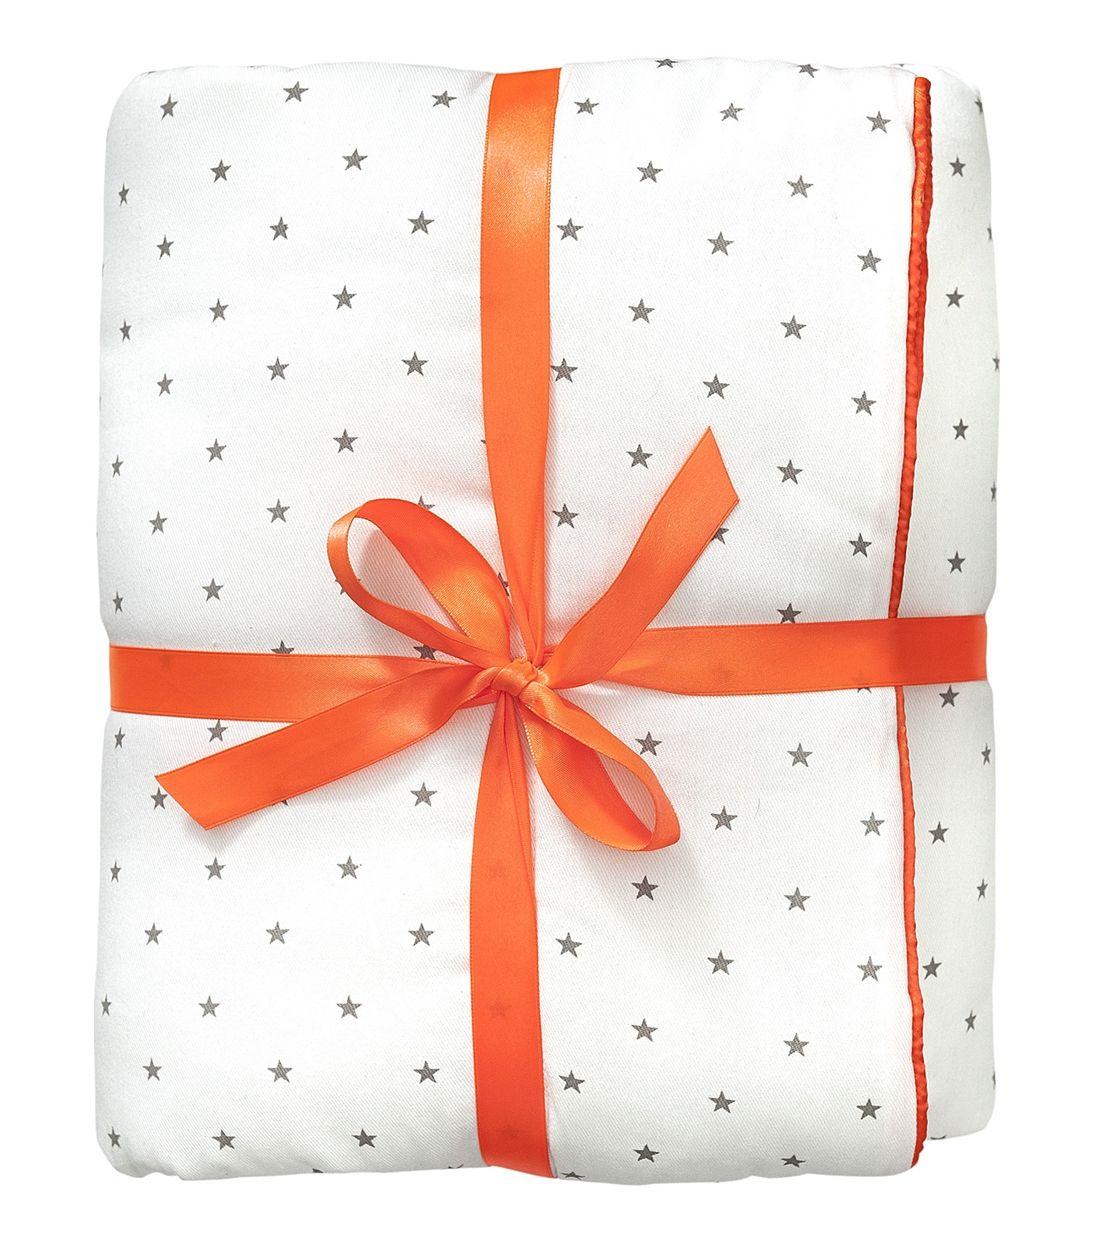 Handdoek Cape Hema.Hema Baby Unisex Boxkleed Speelkleed New Beeb Ideas